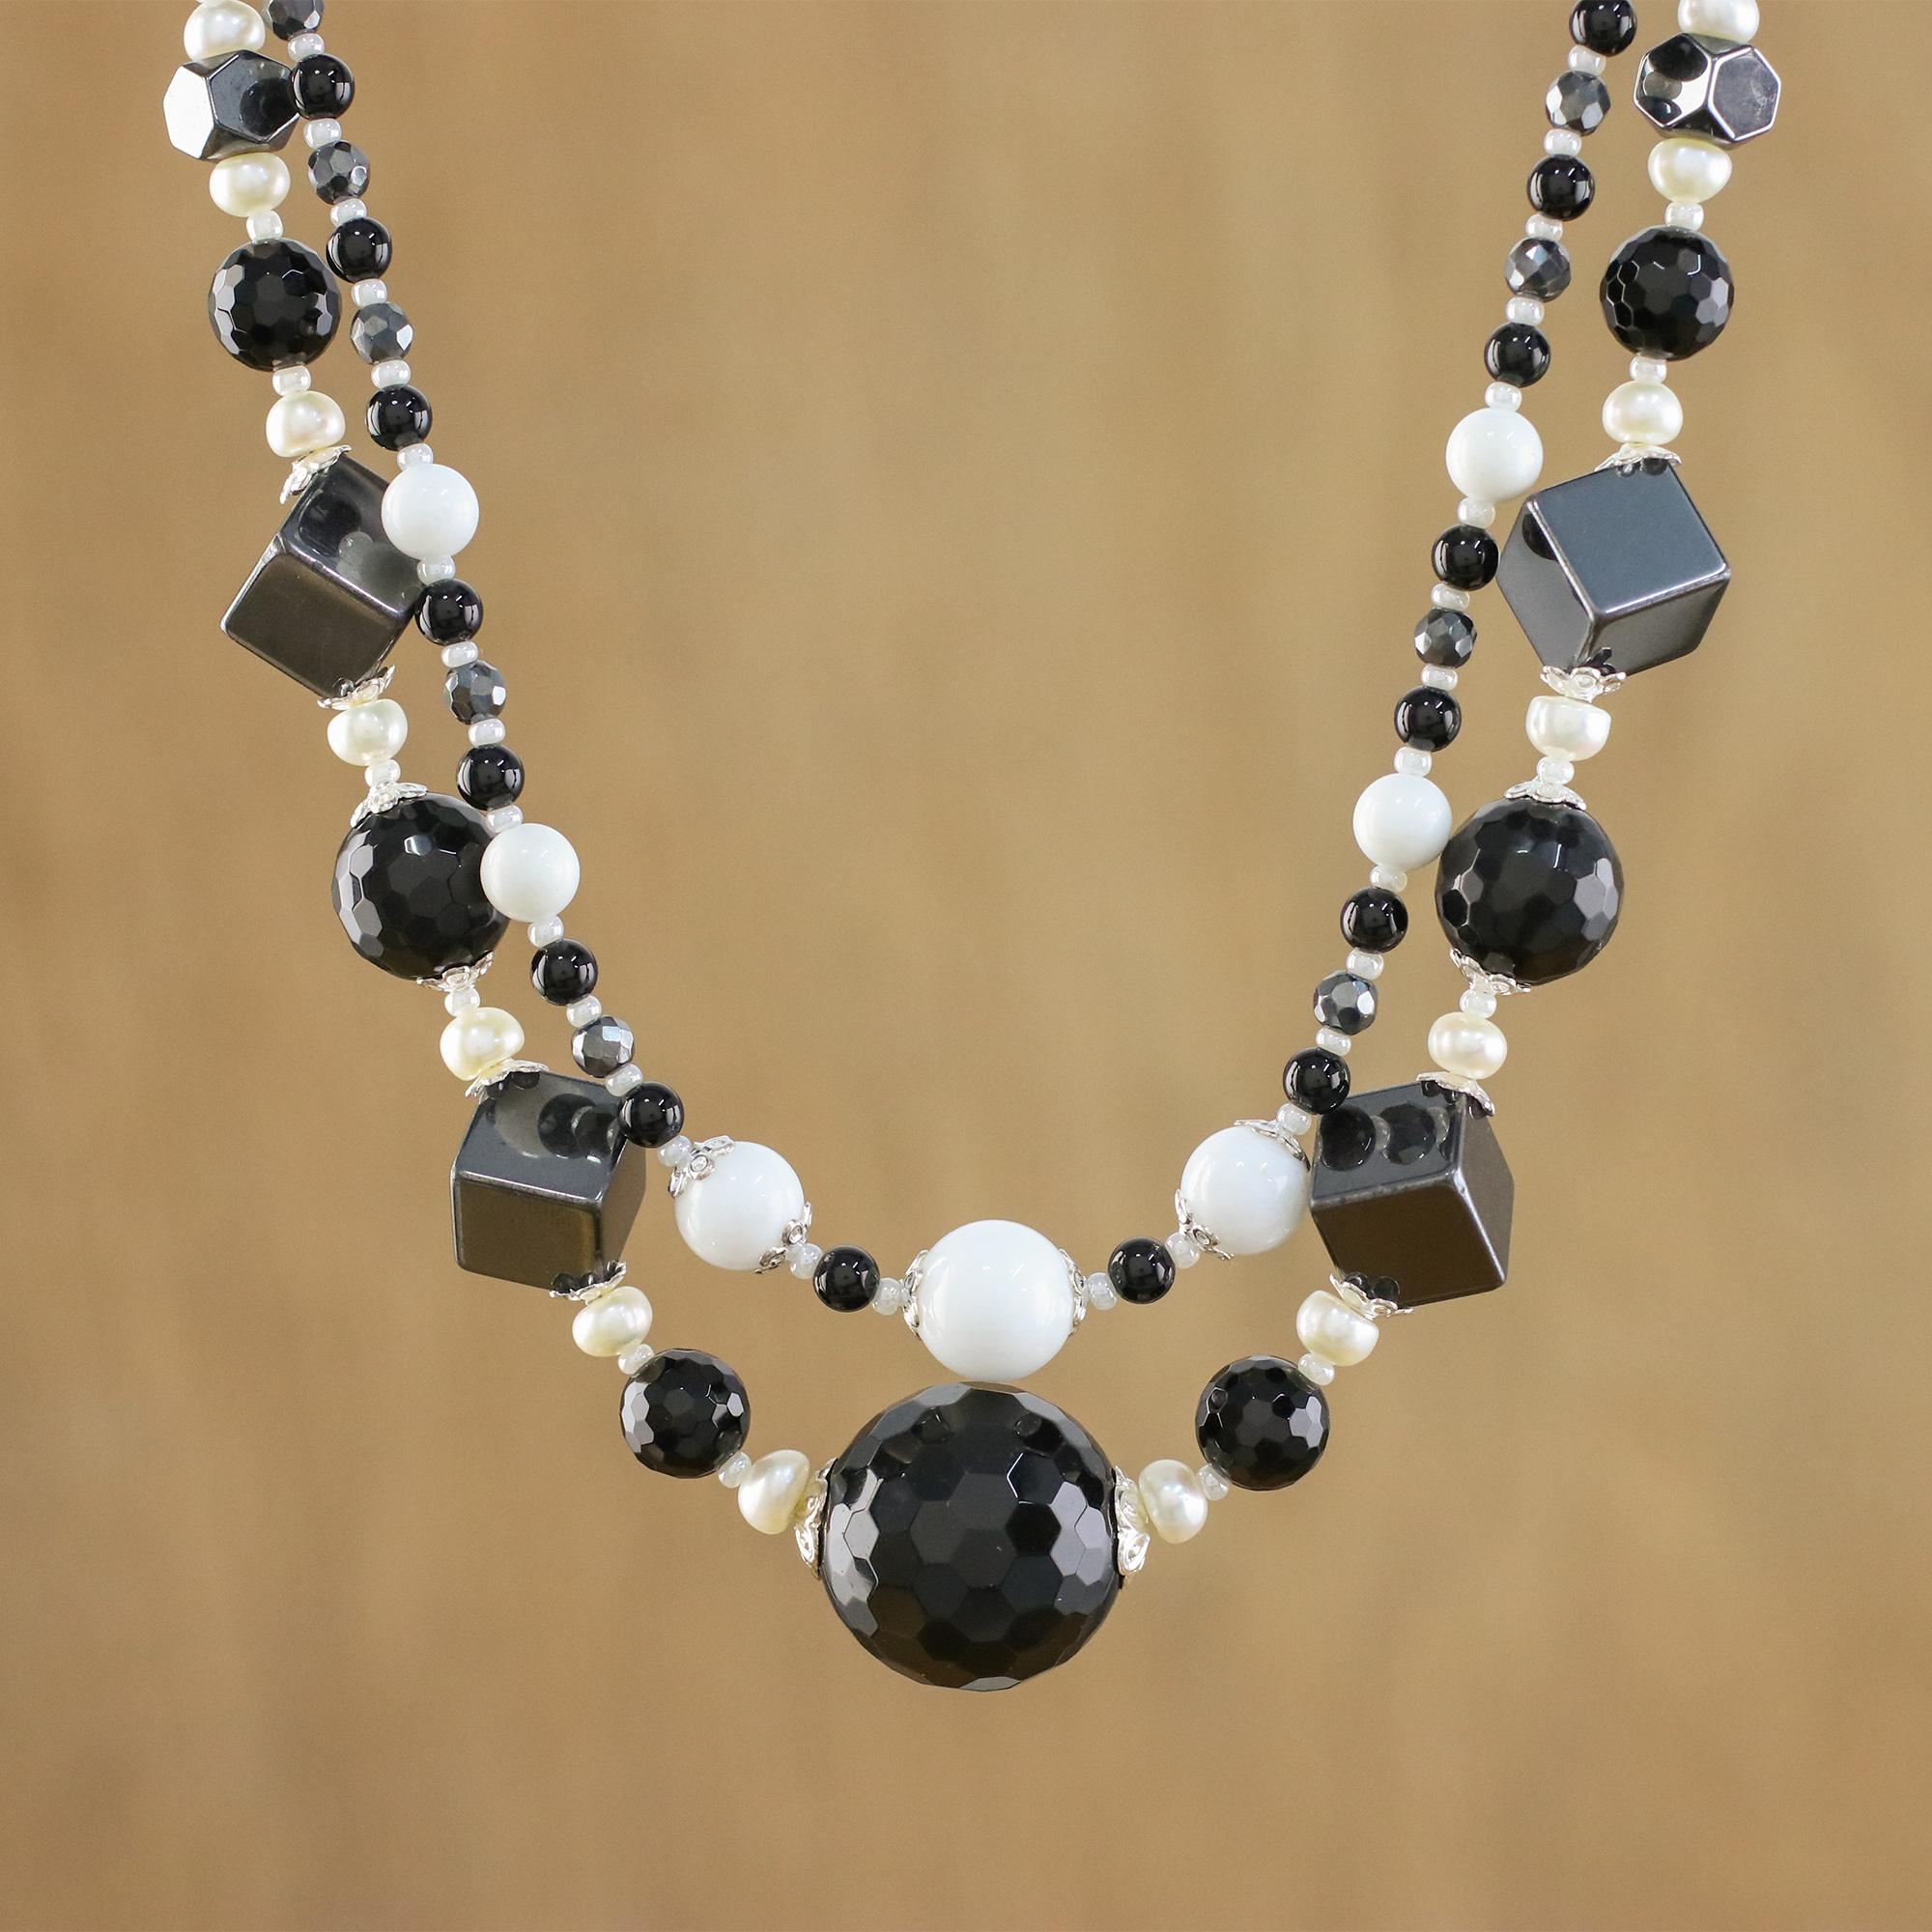 Multi-Gemstone Beaded Necklace Handmade in Thailand - Achromatic ...